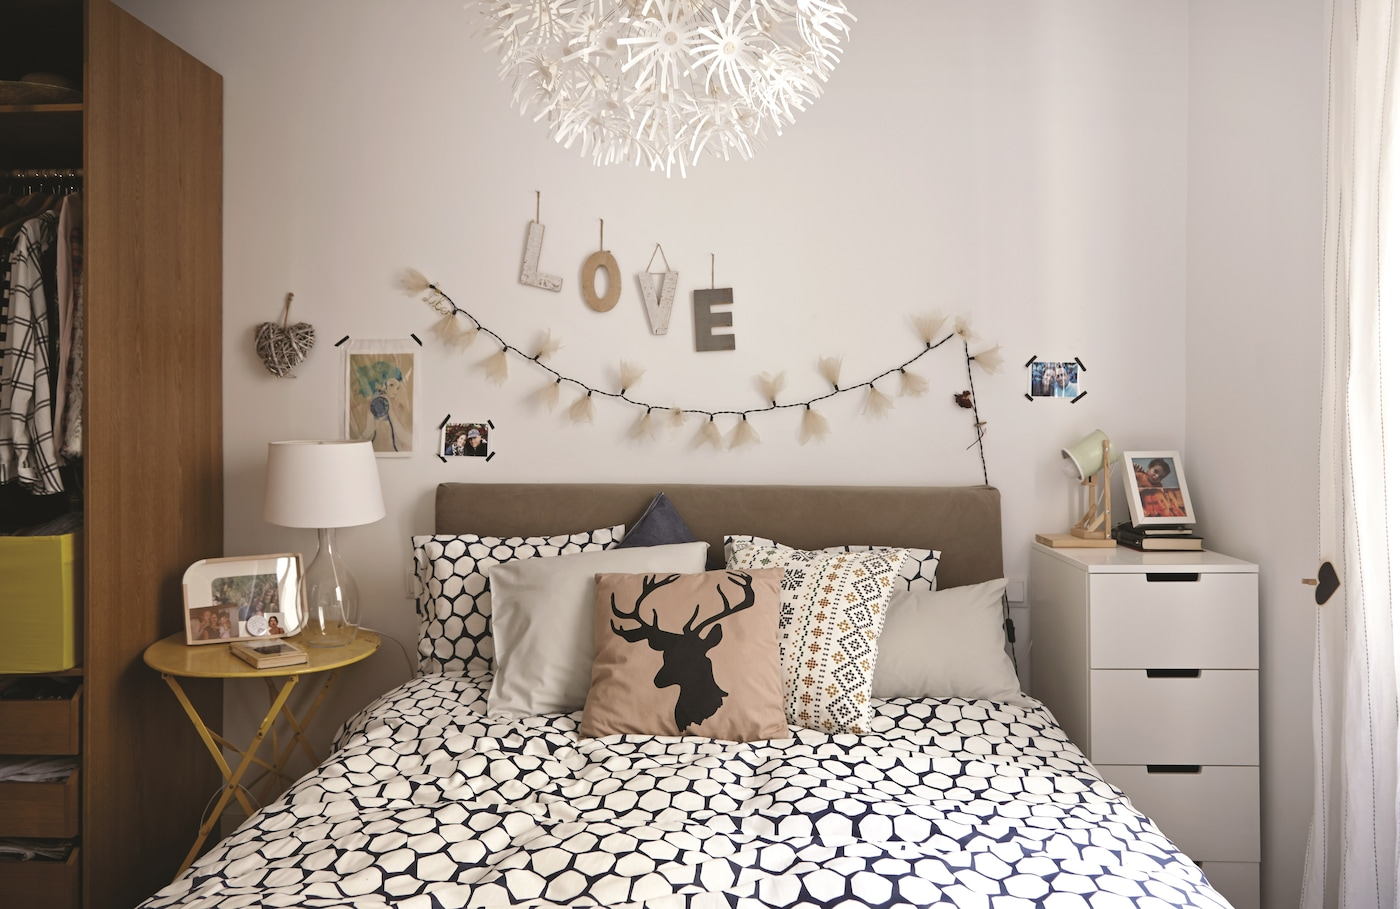 Smart ideas for bedroom storage - IKEA